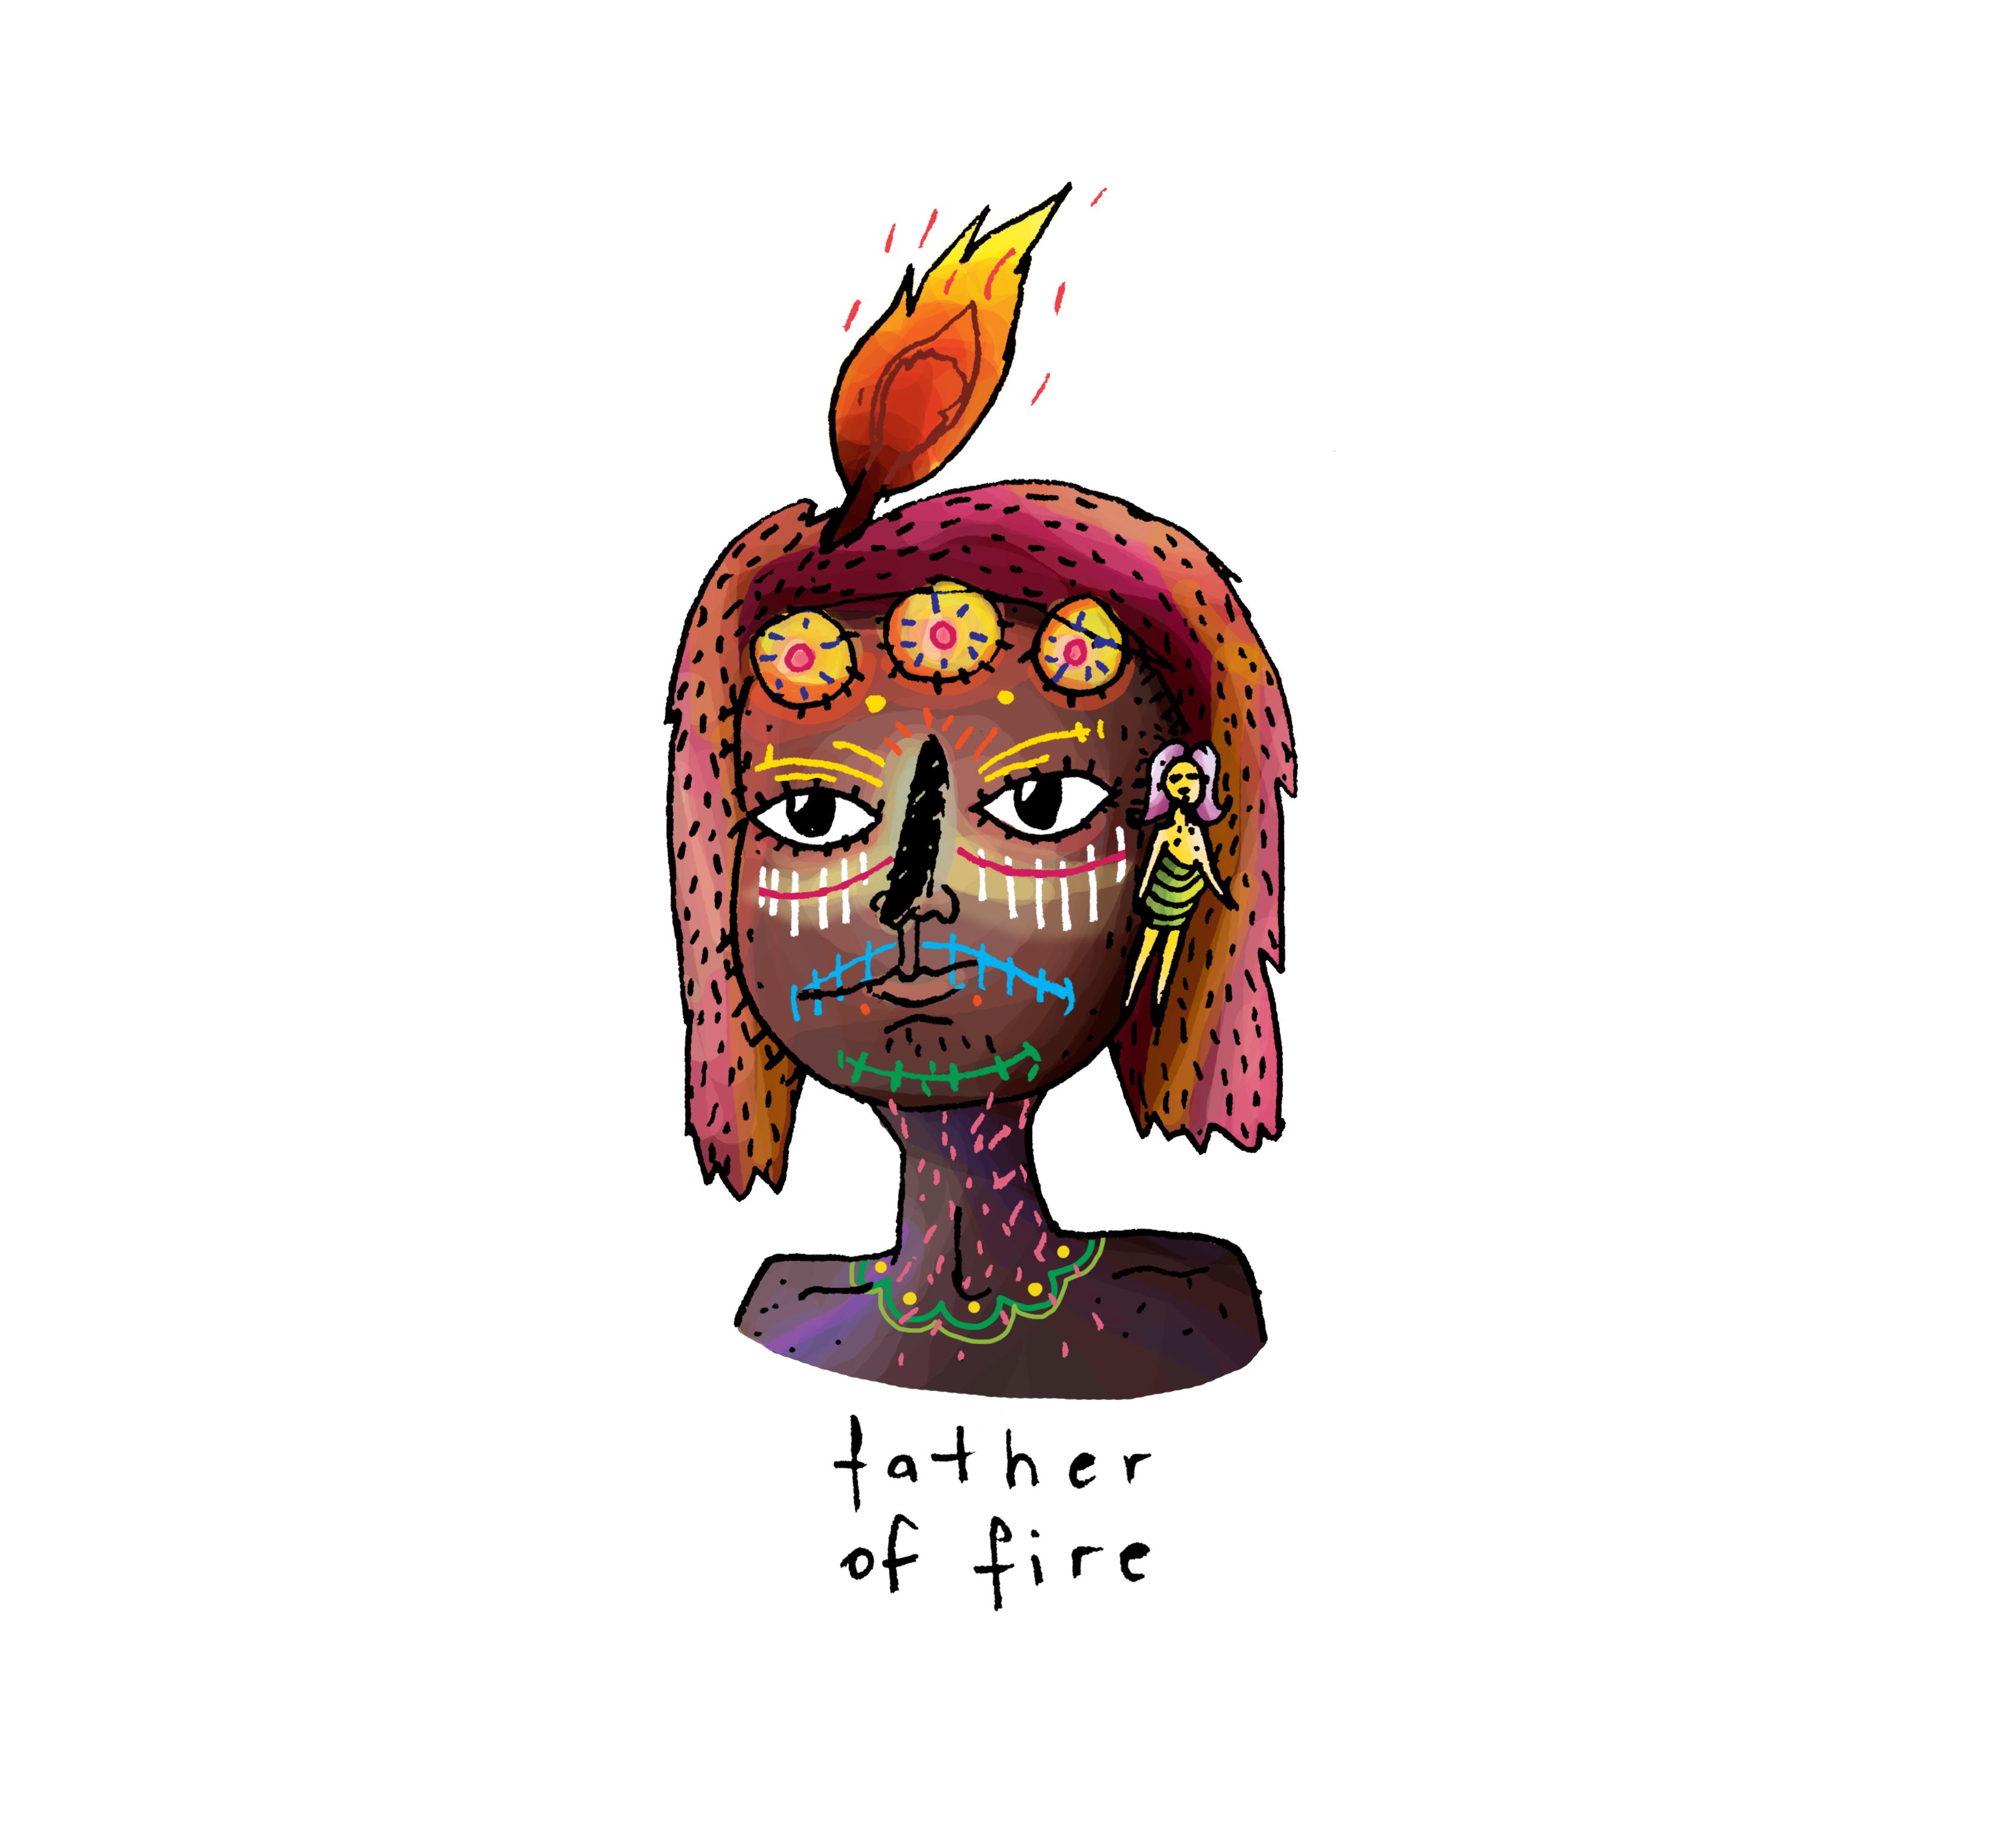 tribalfatheroffire